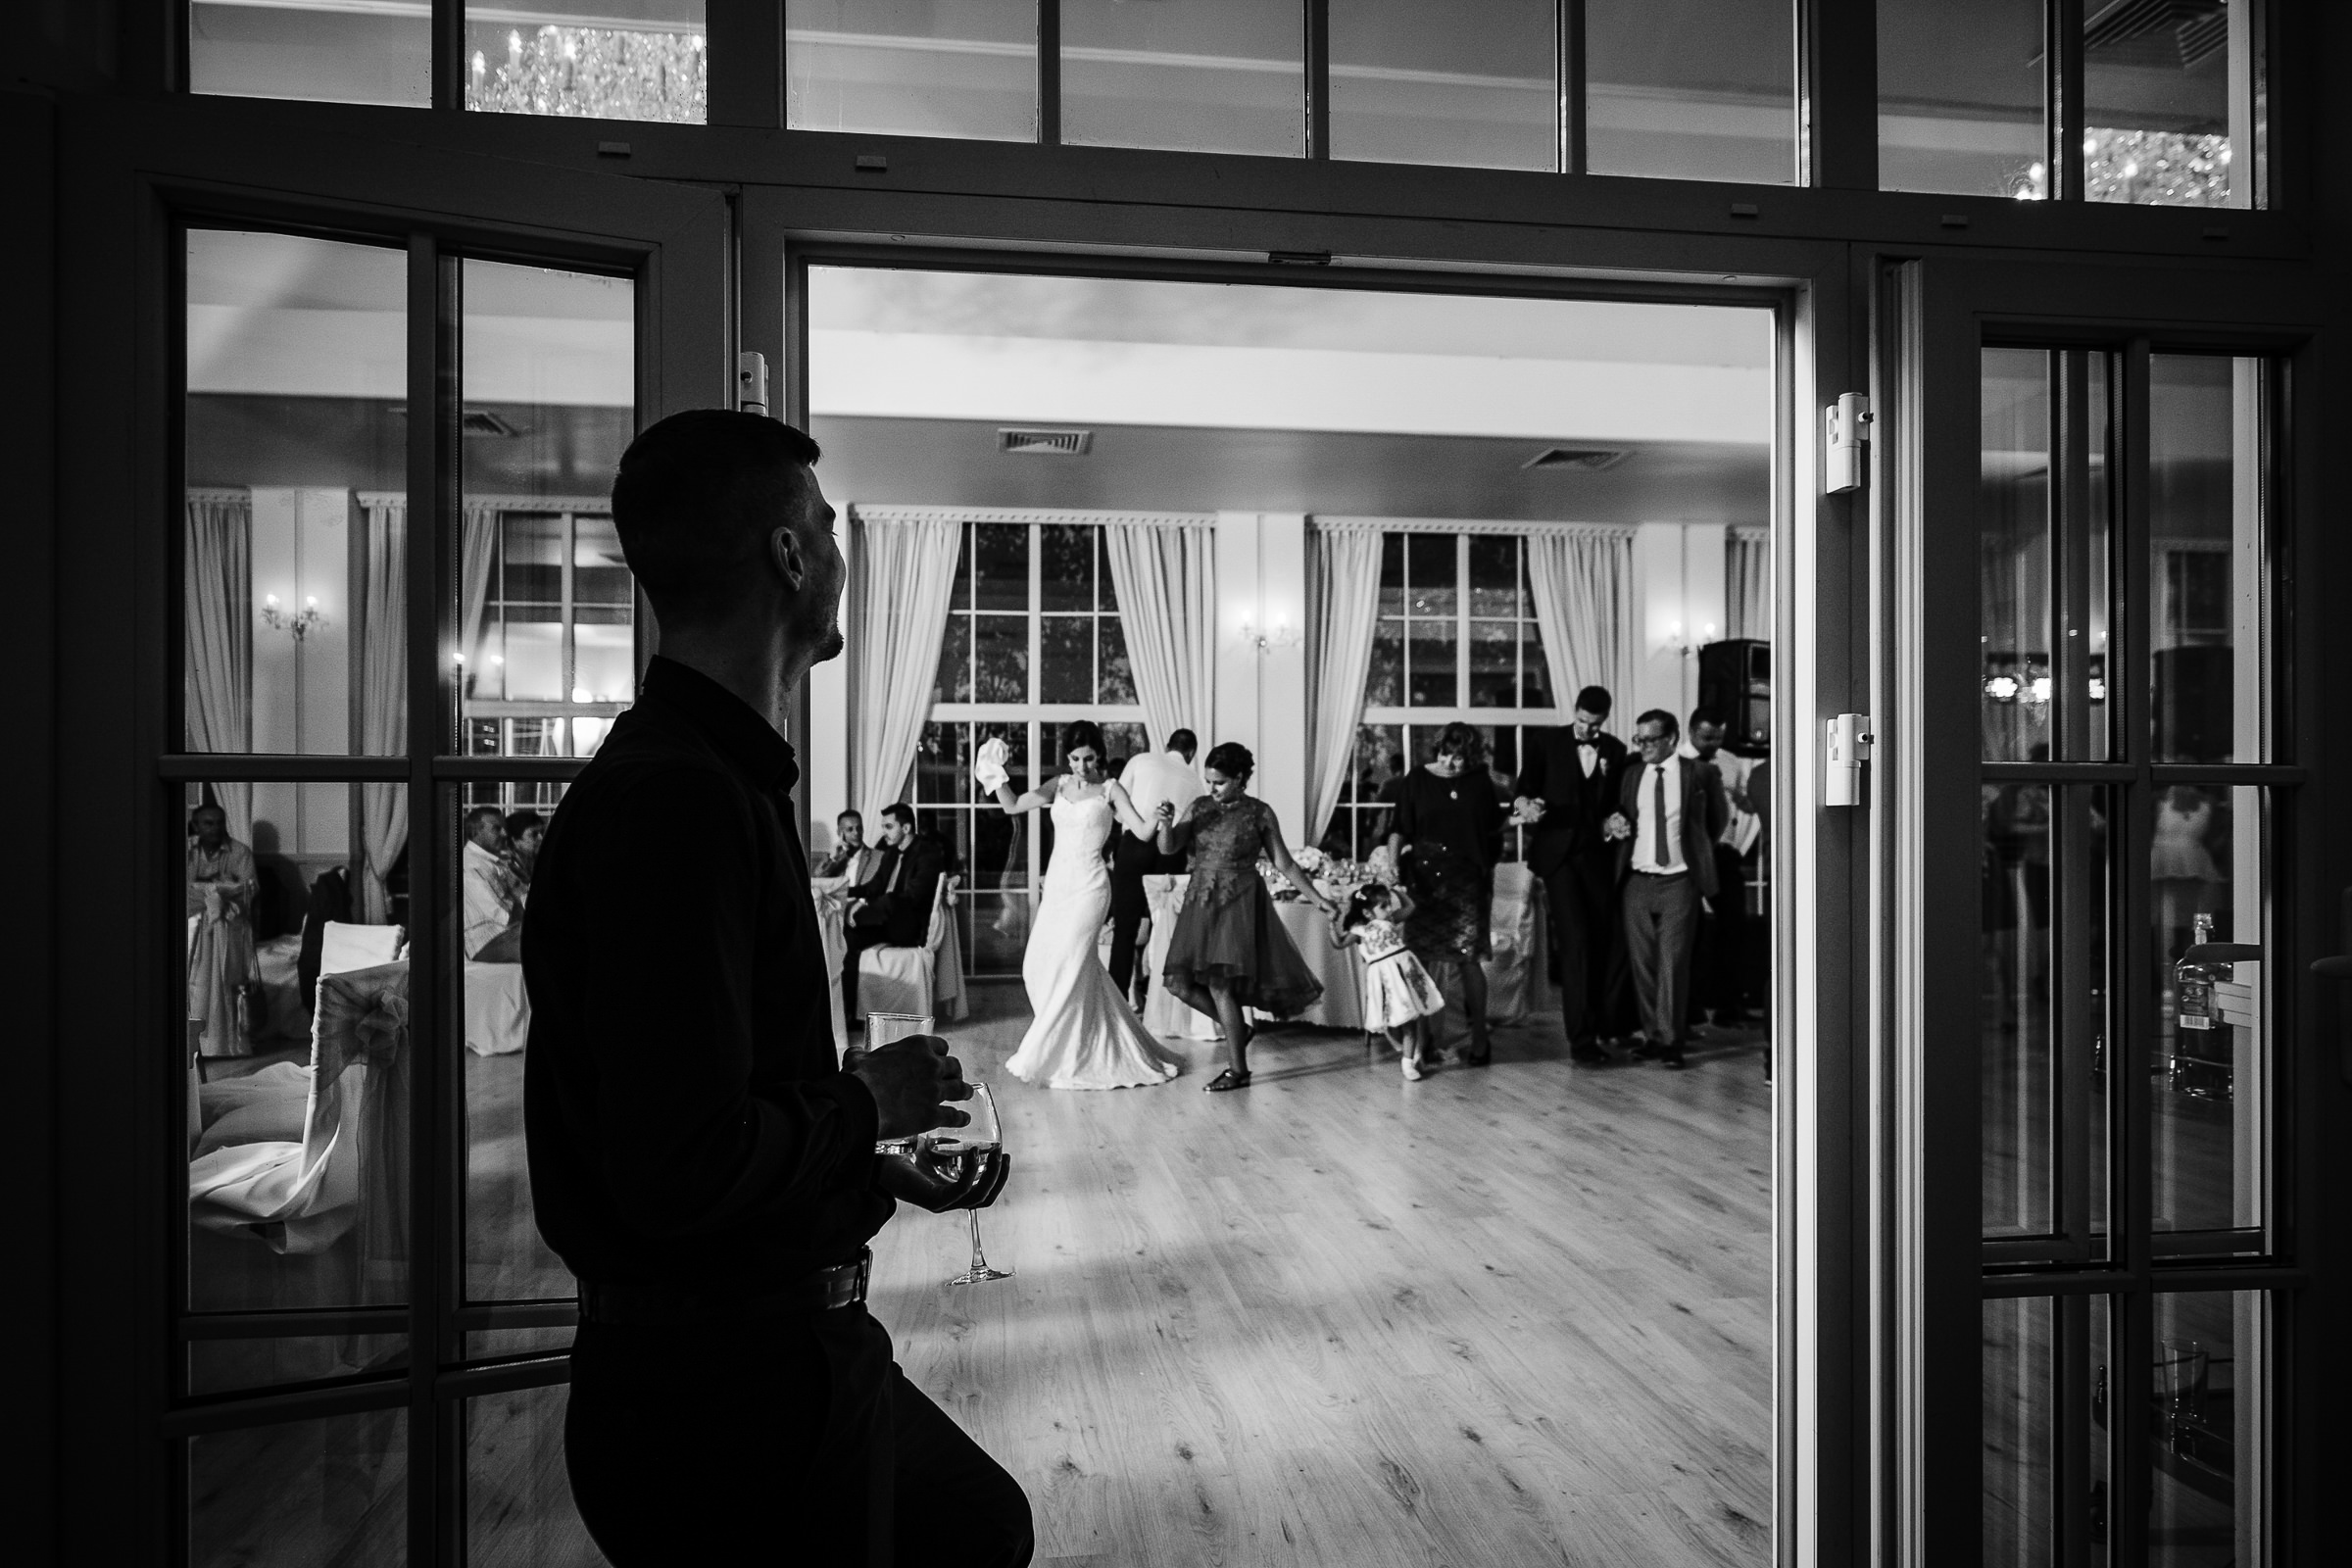 Dancing on the sidelines - photo by Deliysky Studio